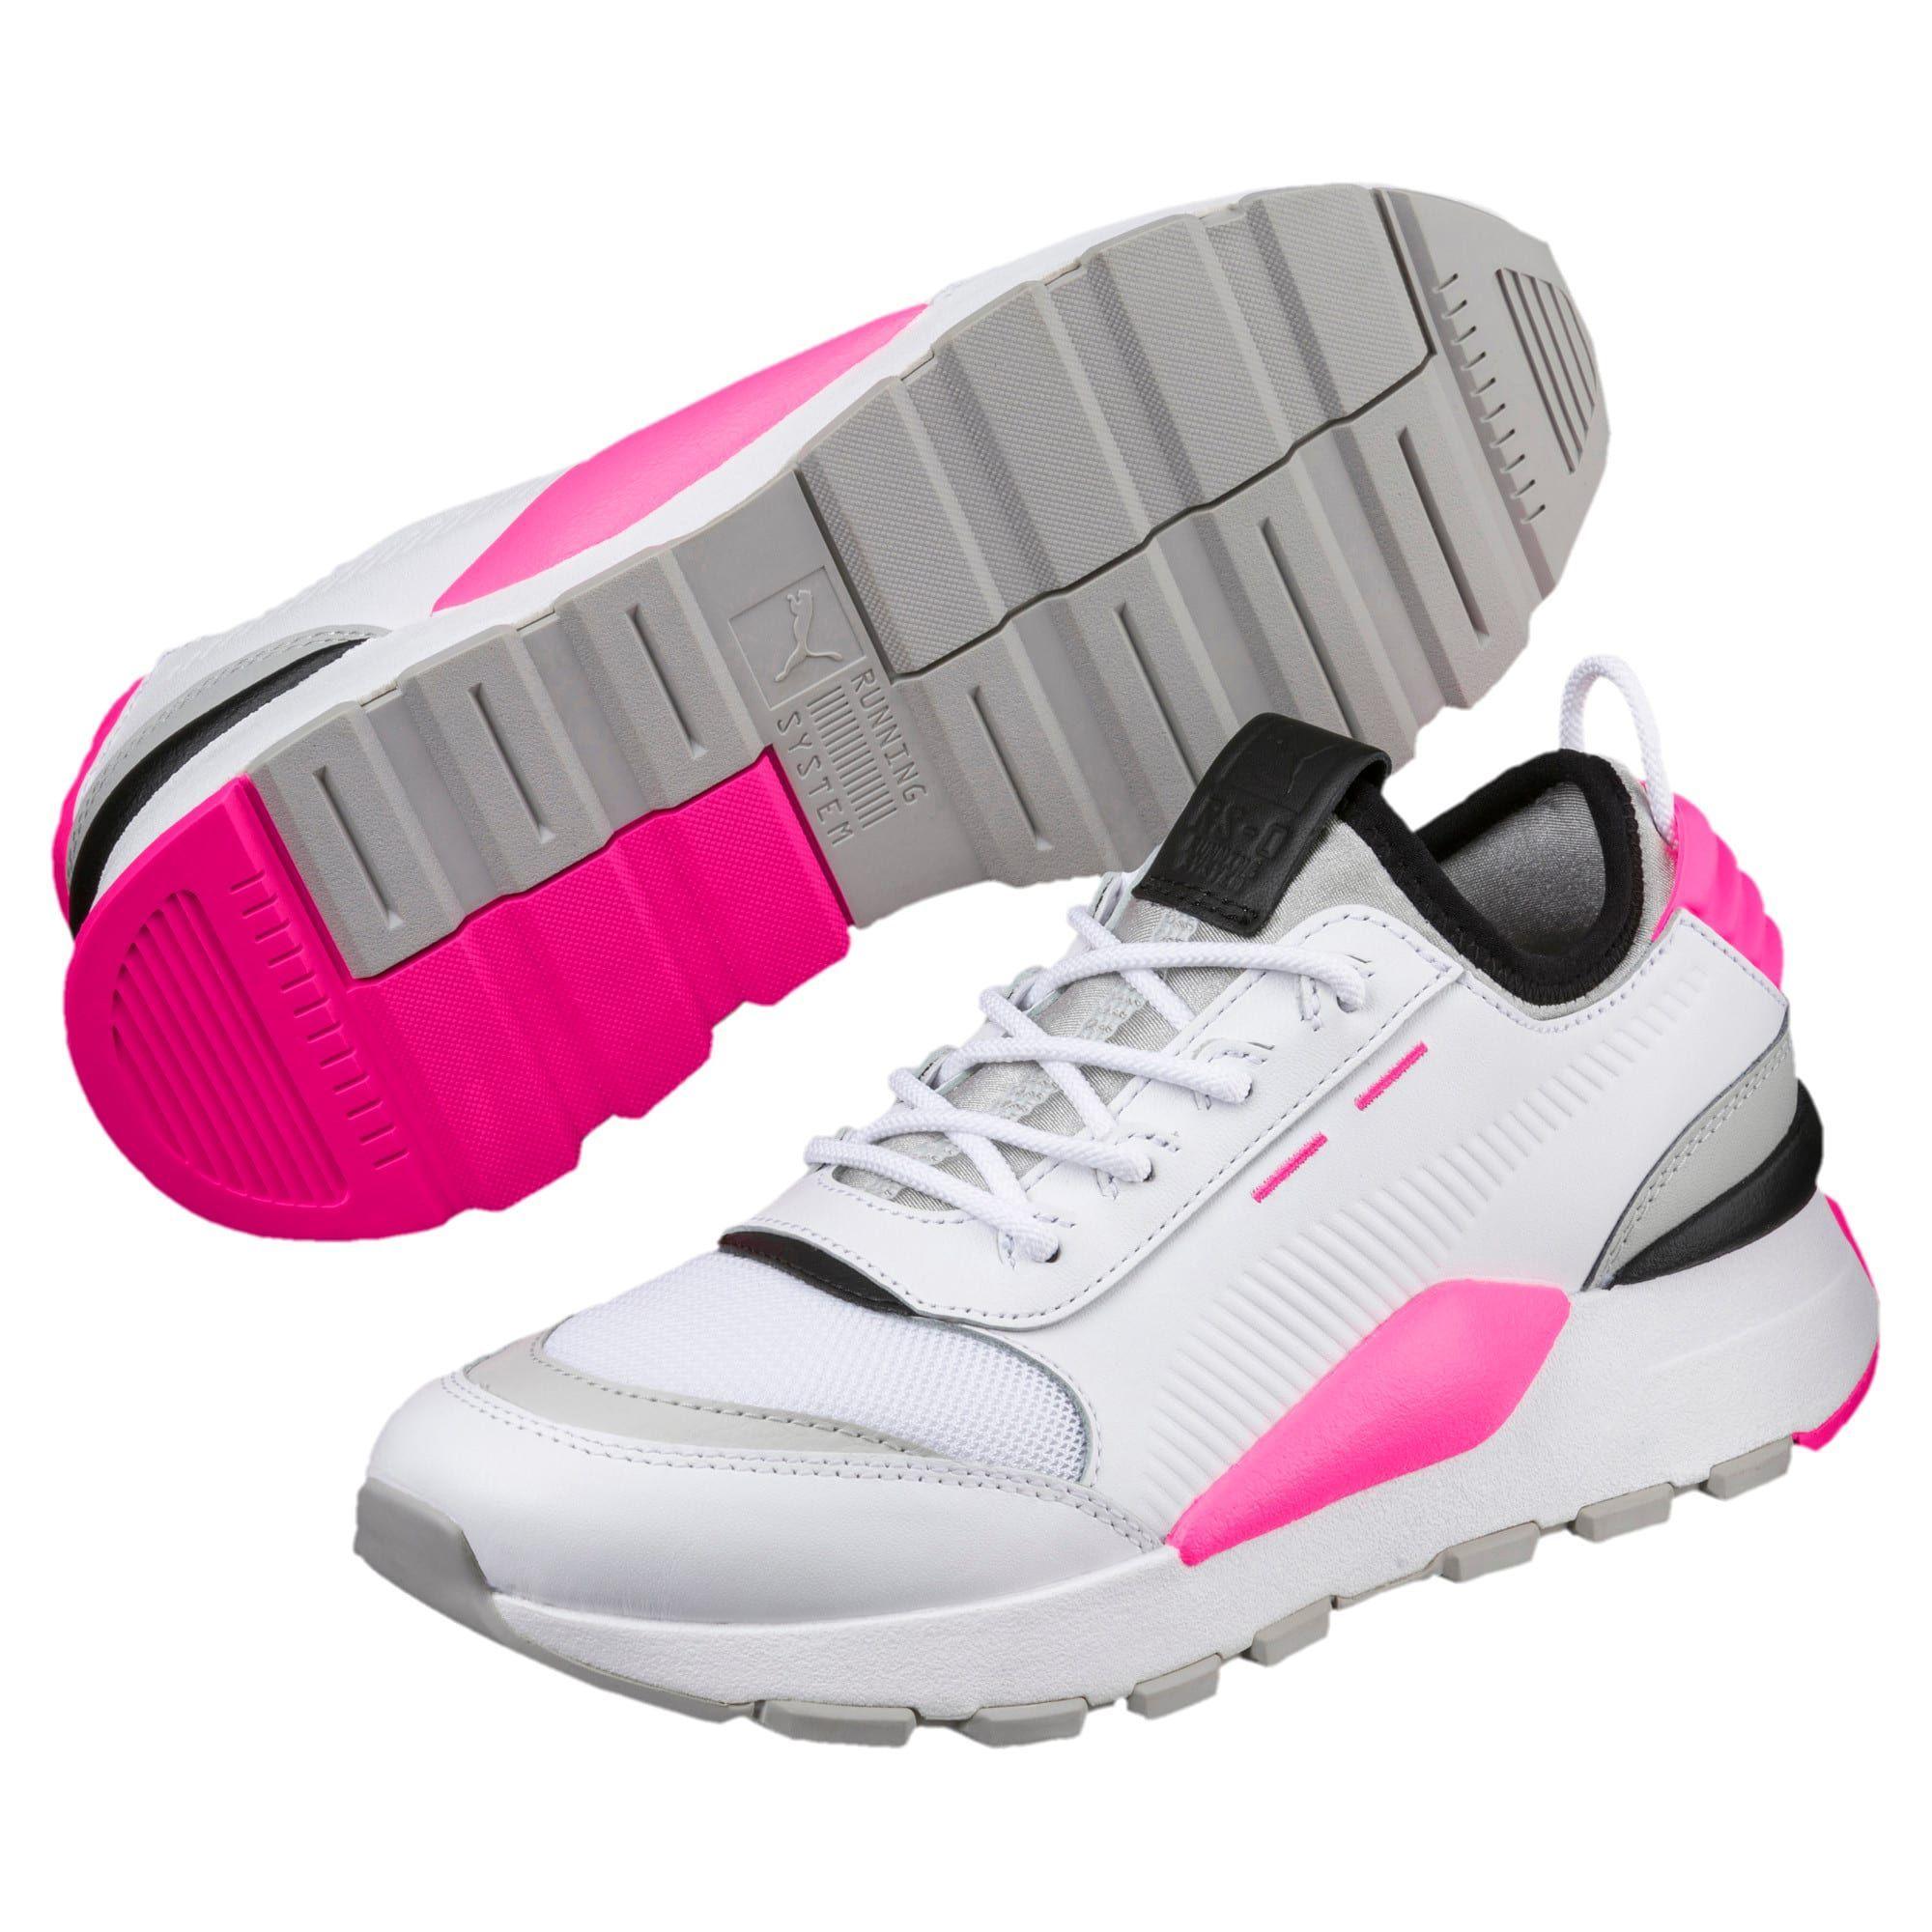 Evolution RS 0 SOUND Trainers   Sneaker, Kinder schuhe, Puma